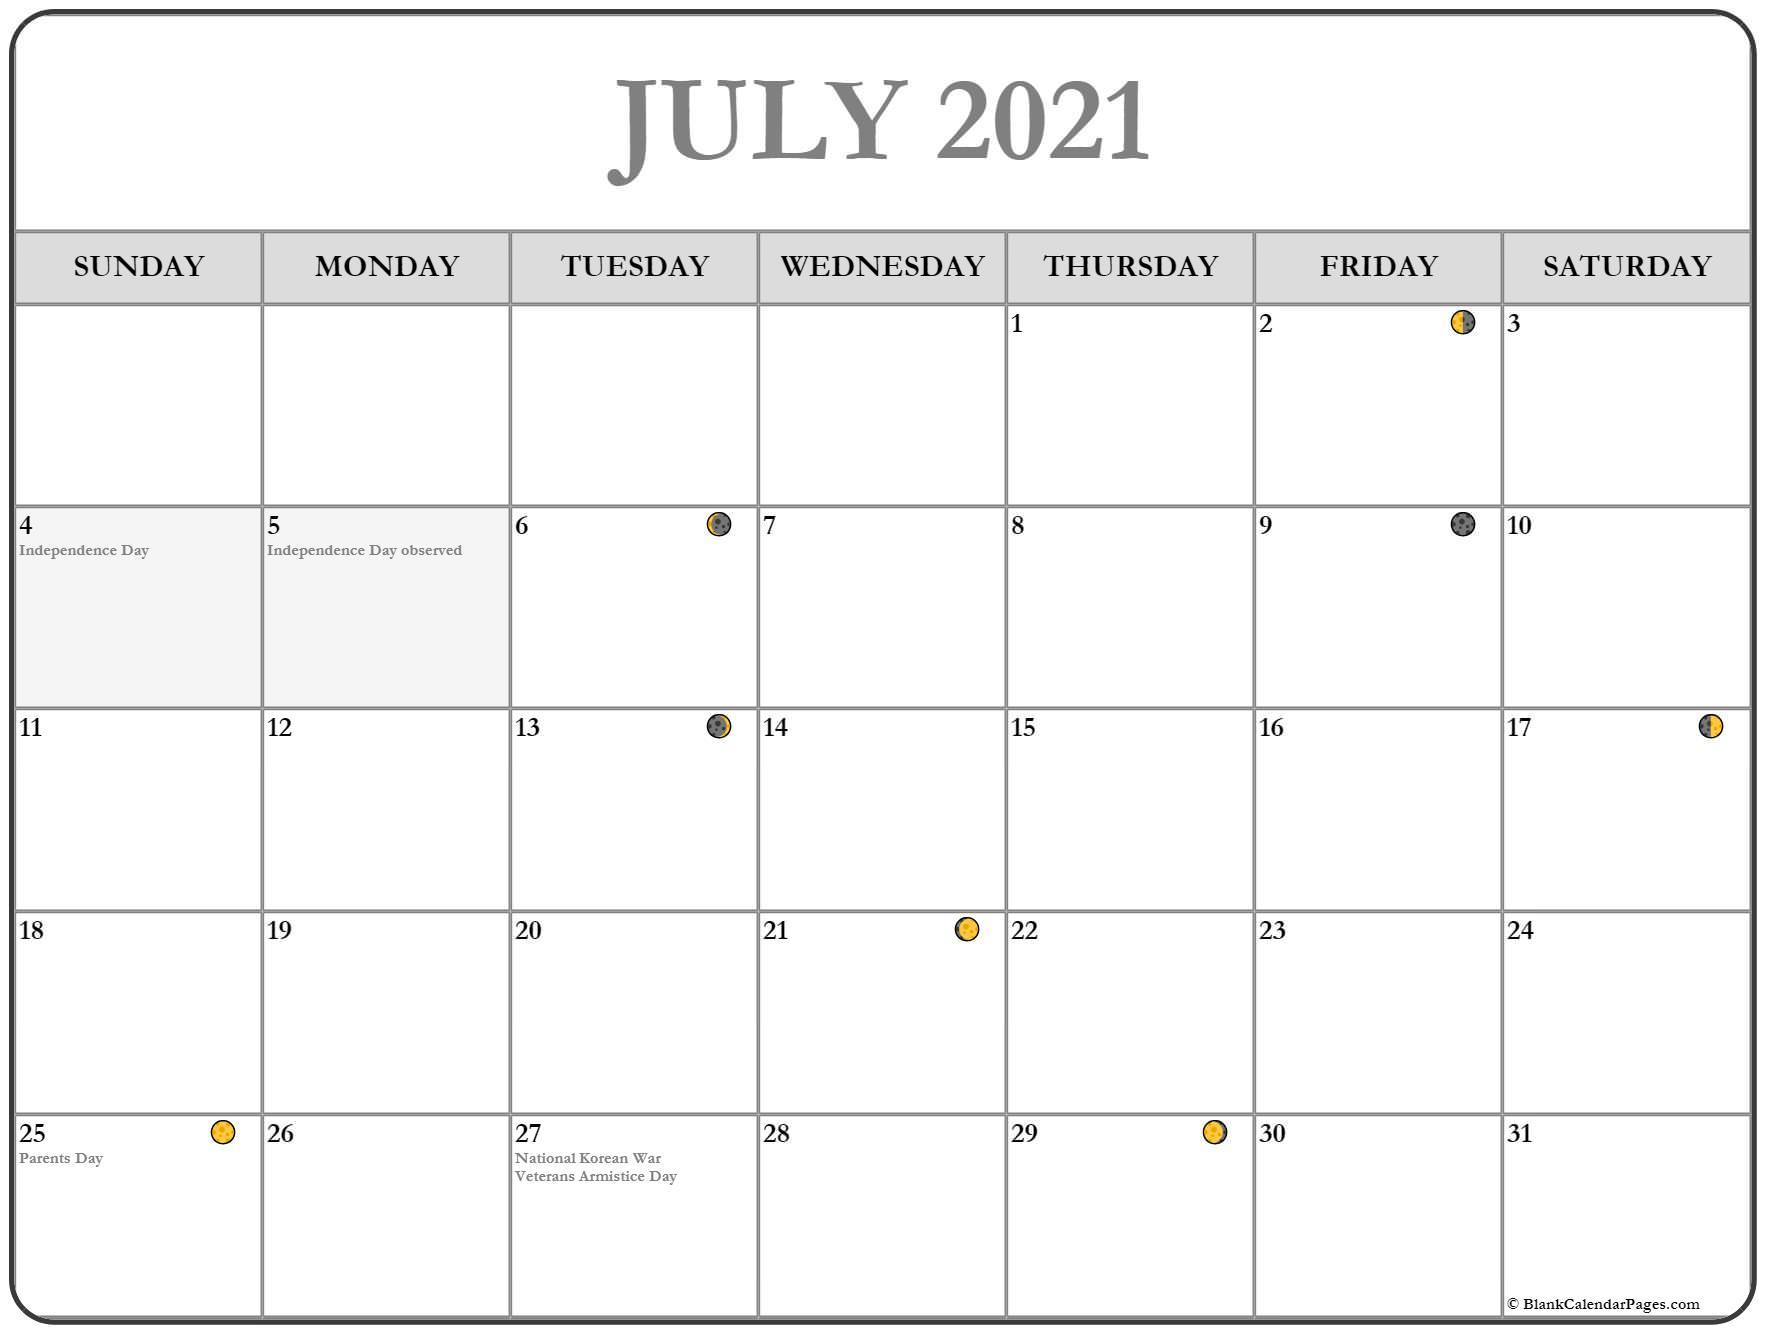 July 2021 Lunar Calendar | Moon Phase Calendar With 2021 Deer Hunting Lunar Calendar